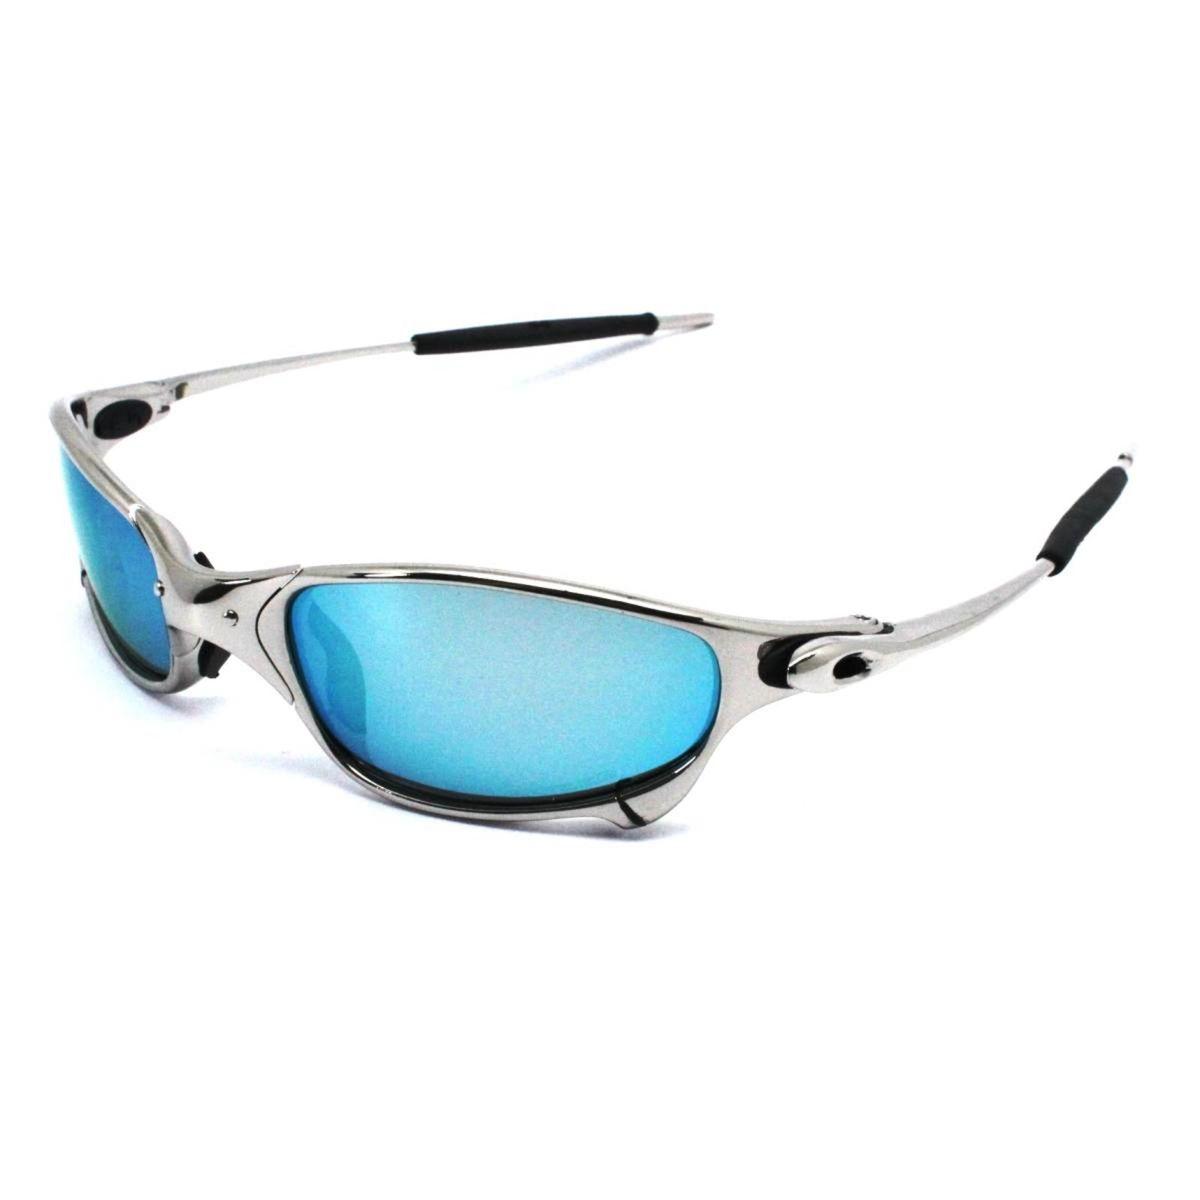 Óculos Oakley Juliet 100% Polarizado Promoção!!!   Óculos Masculino ... 5b558bb631